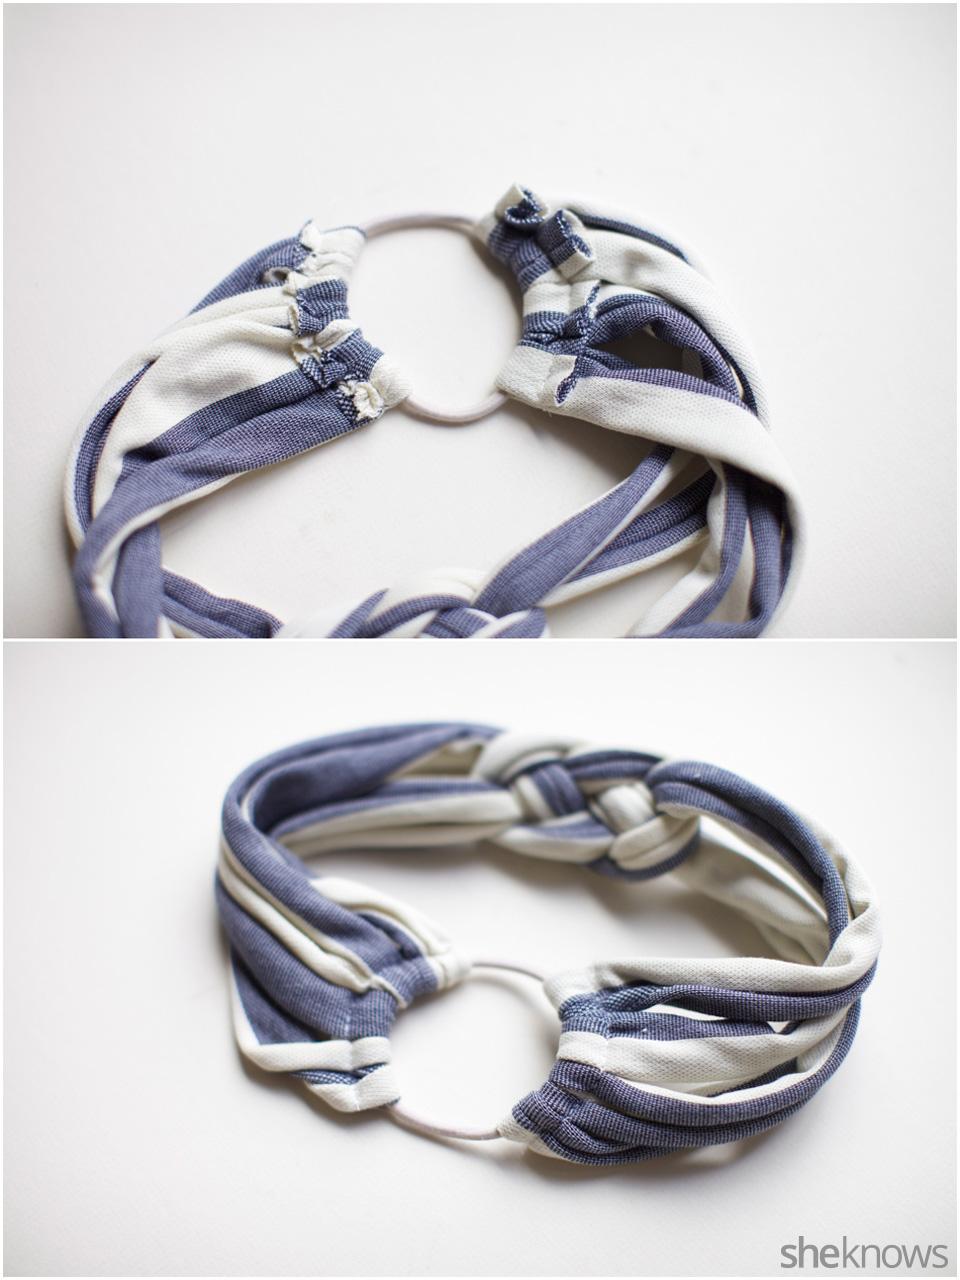 Sailor's knot T-shirt headband: Step 5